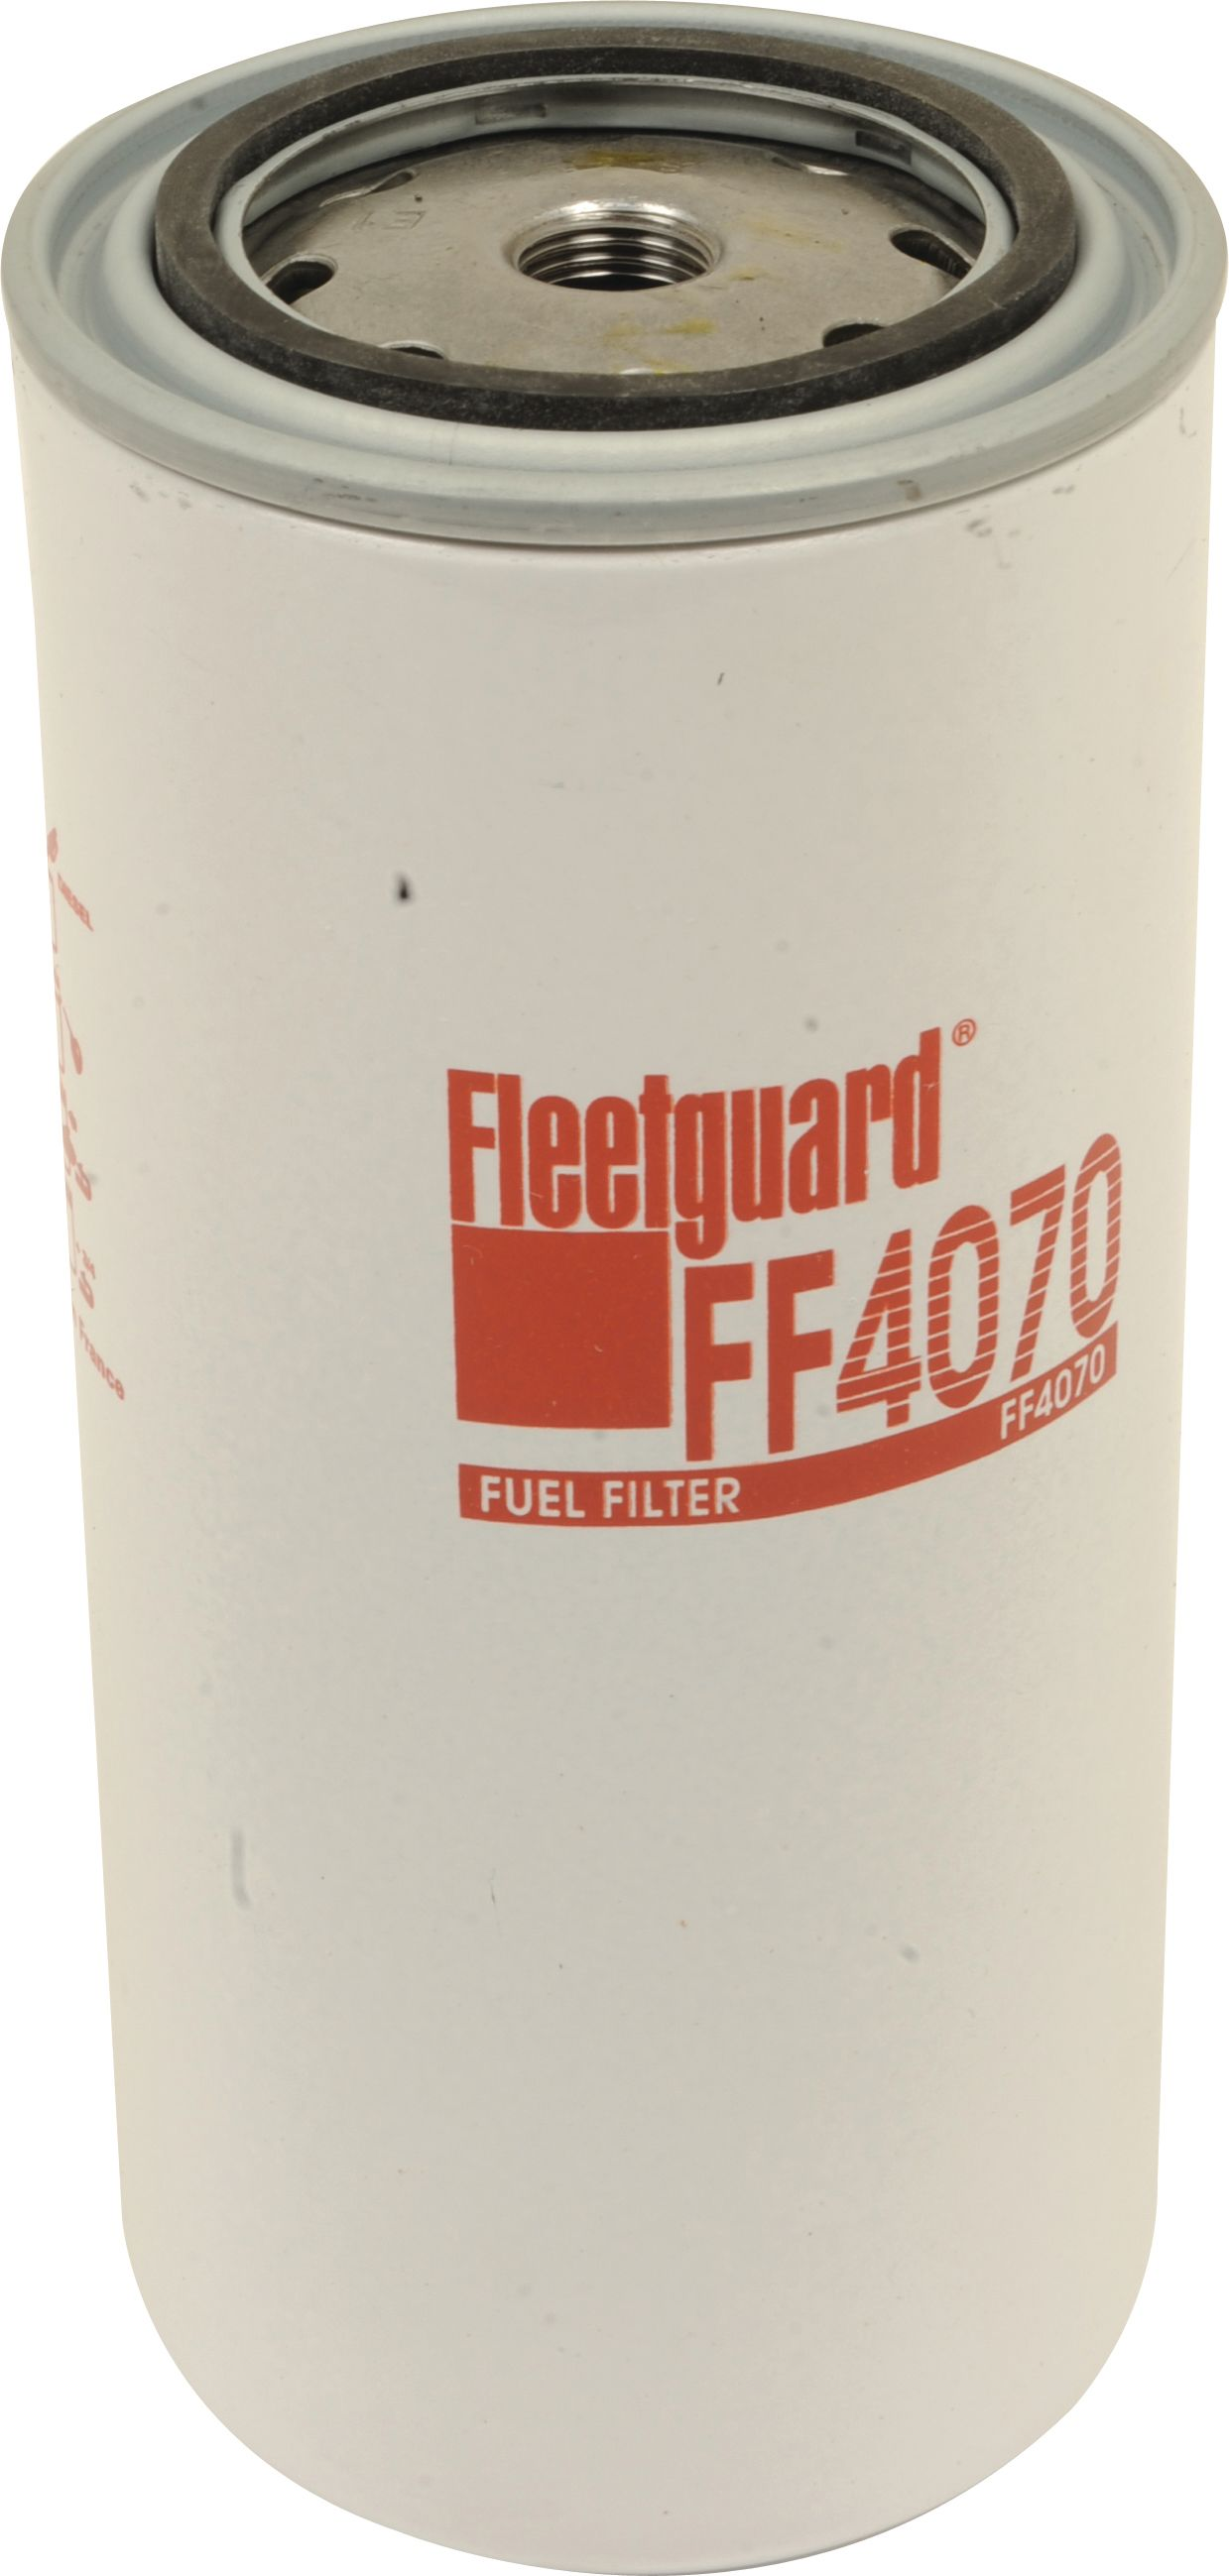 CLAAS FUEL FILTER FF4070 109046